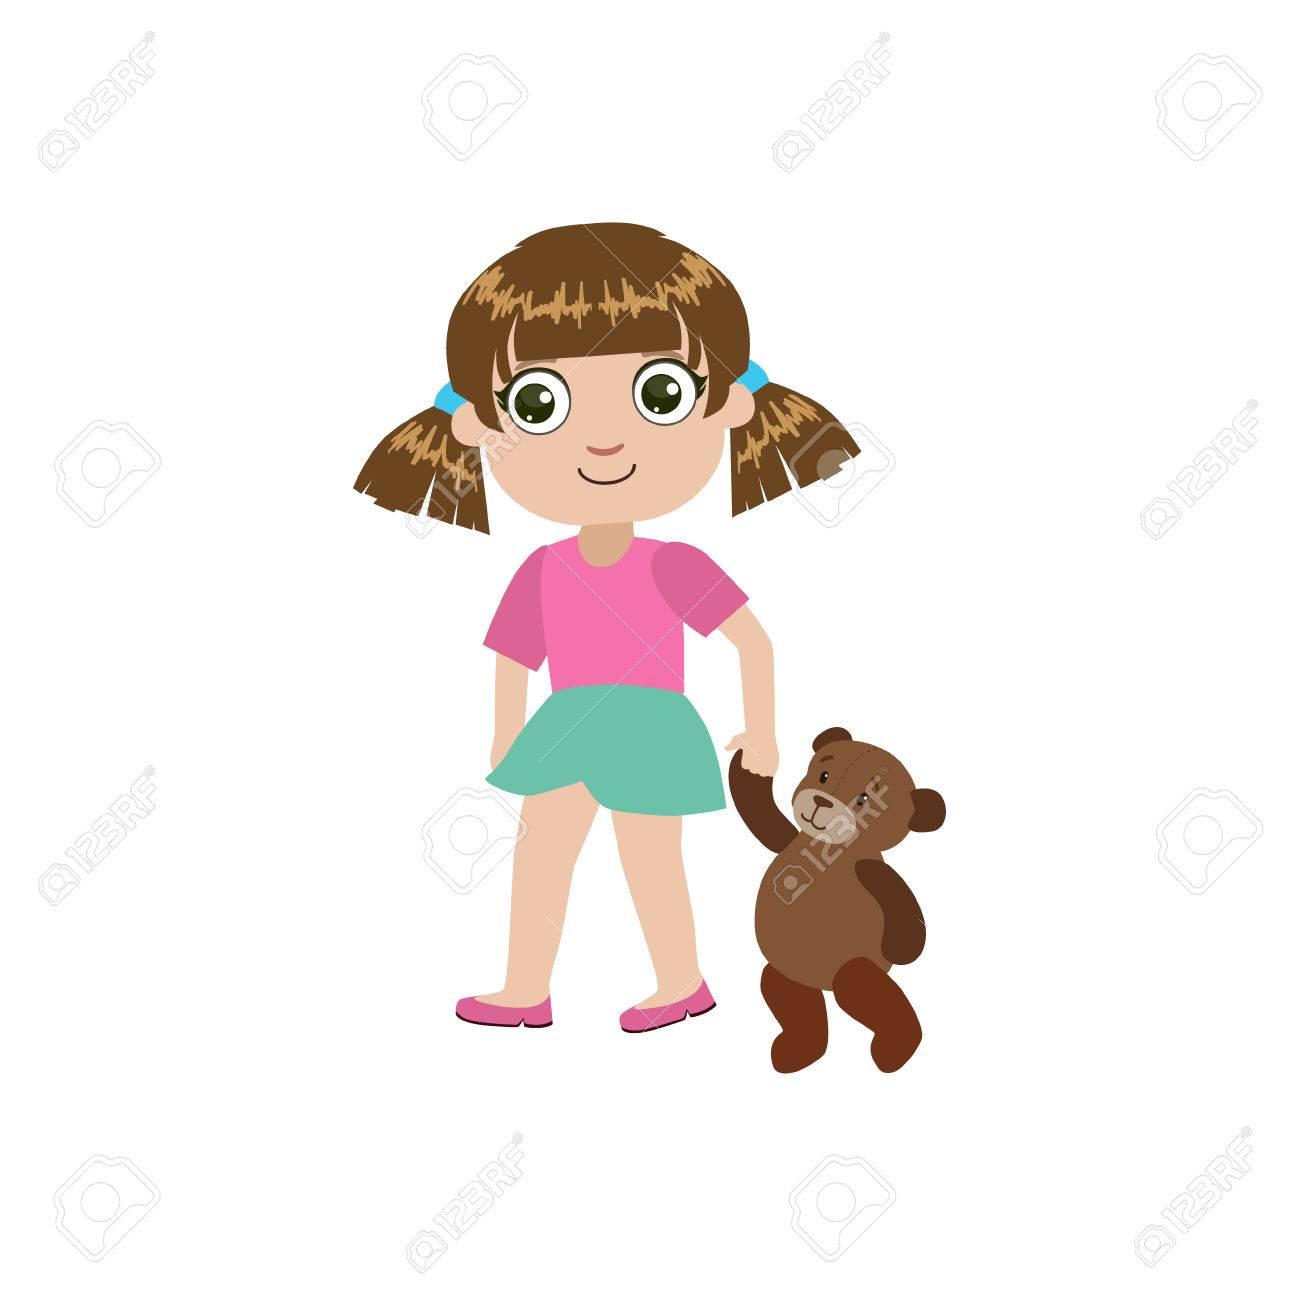 Fille Walking With Teddy Bear Colorful Conception Simple Dessin Vectoriel Isolé Sur Fond Blanc